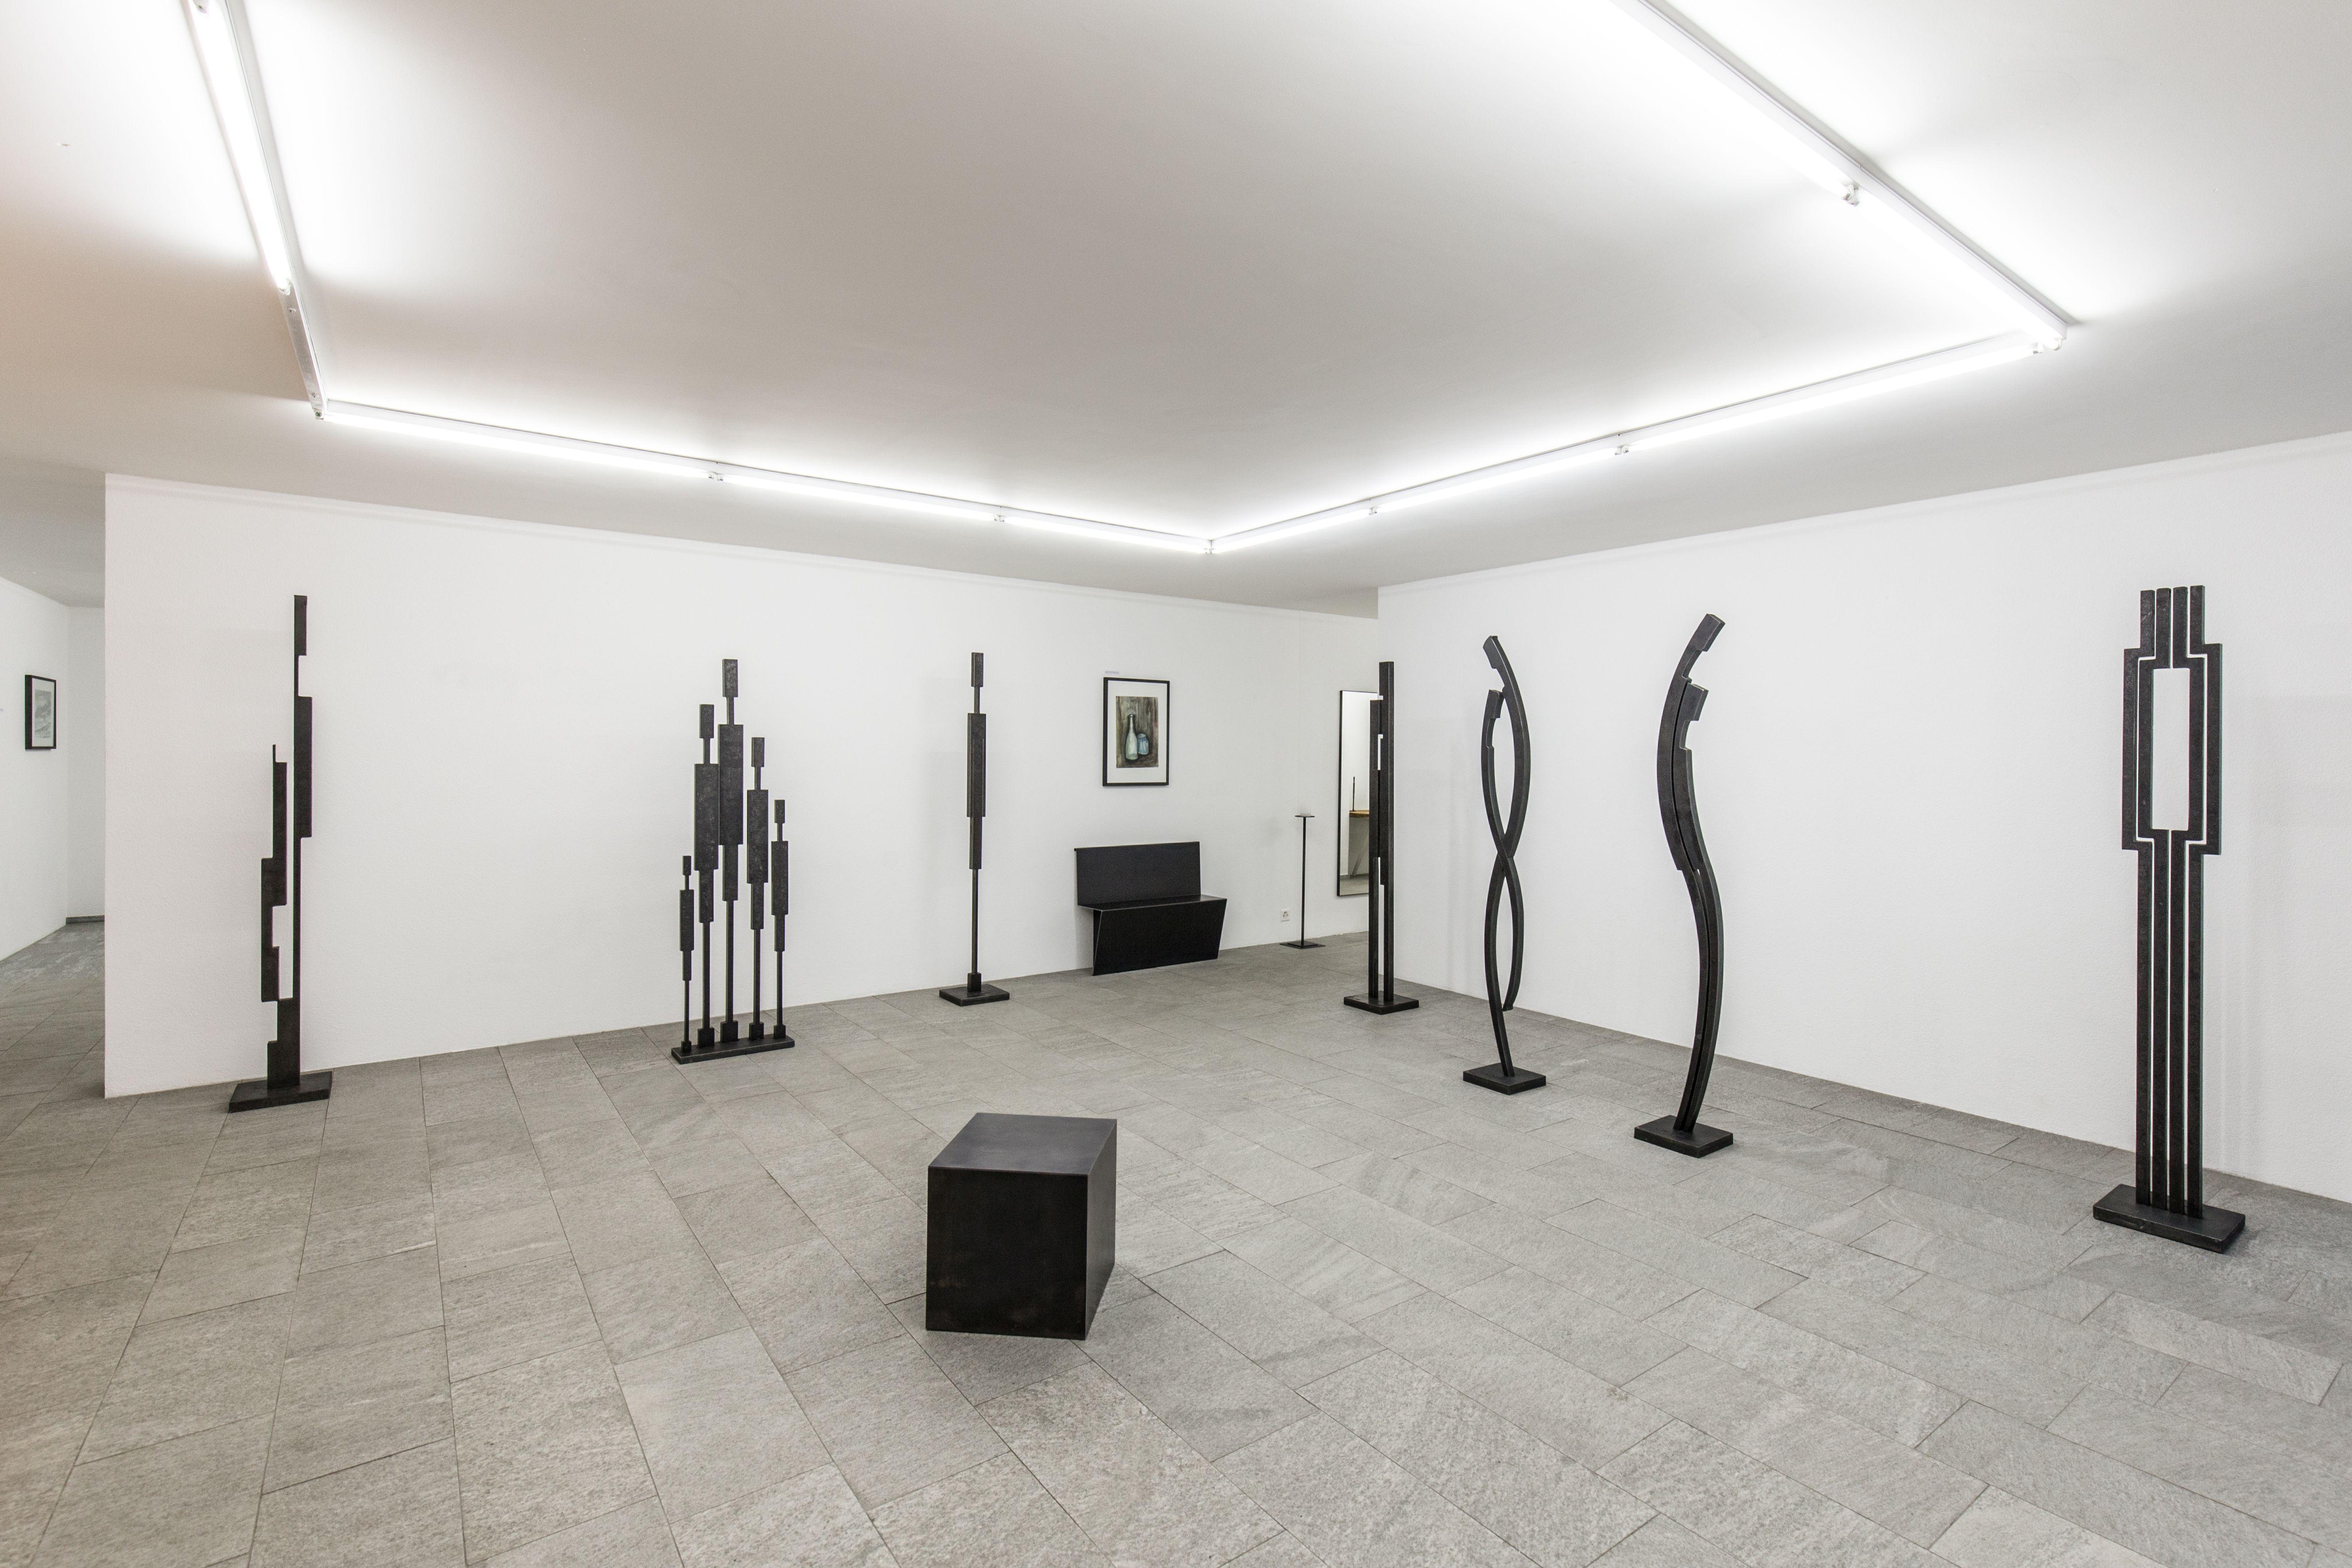 Galerie Enrico Giacometti Slide 1